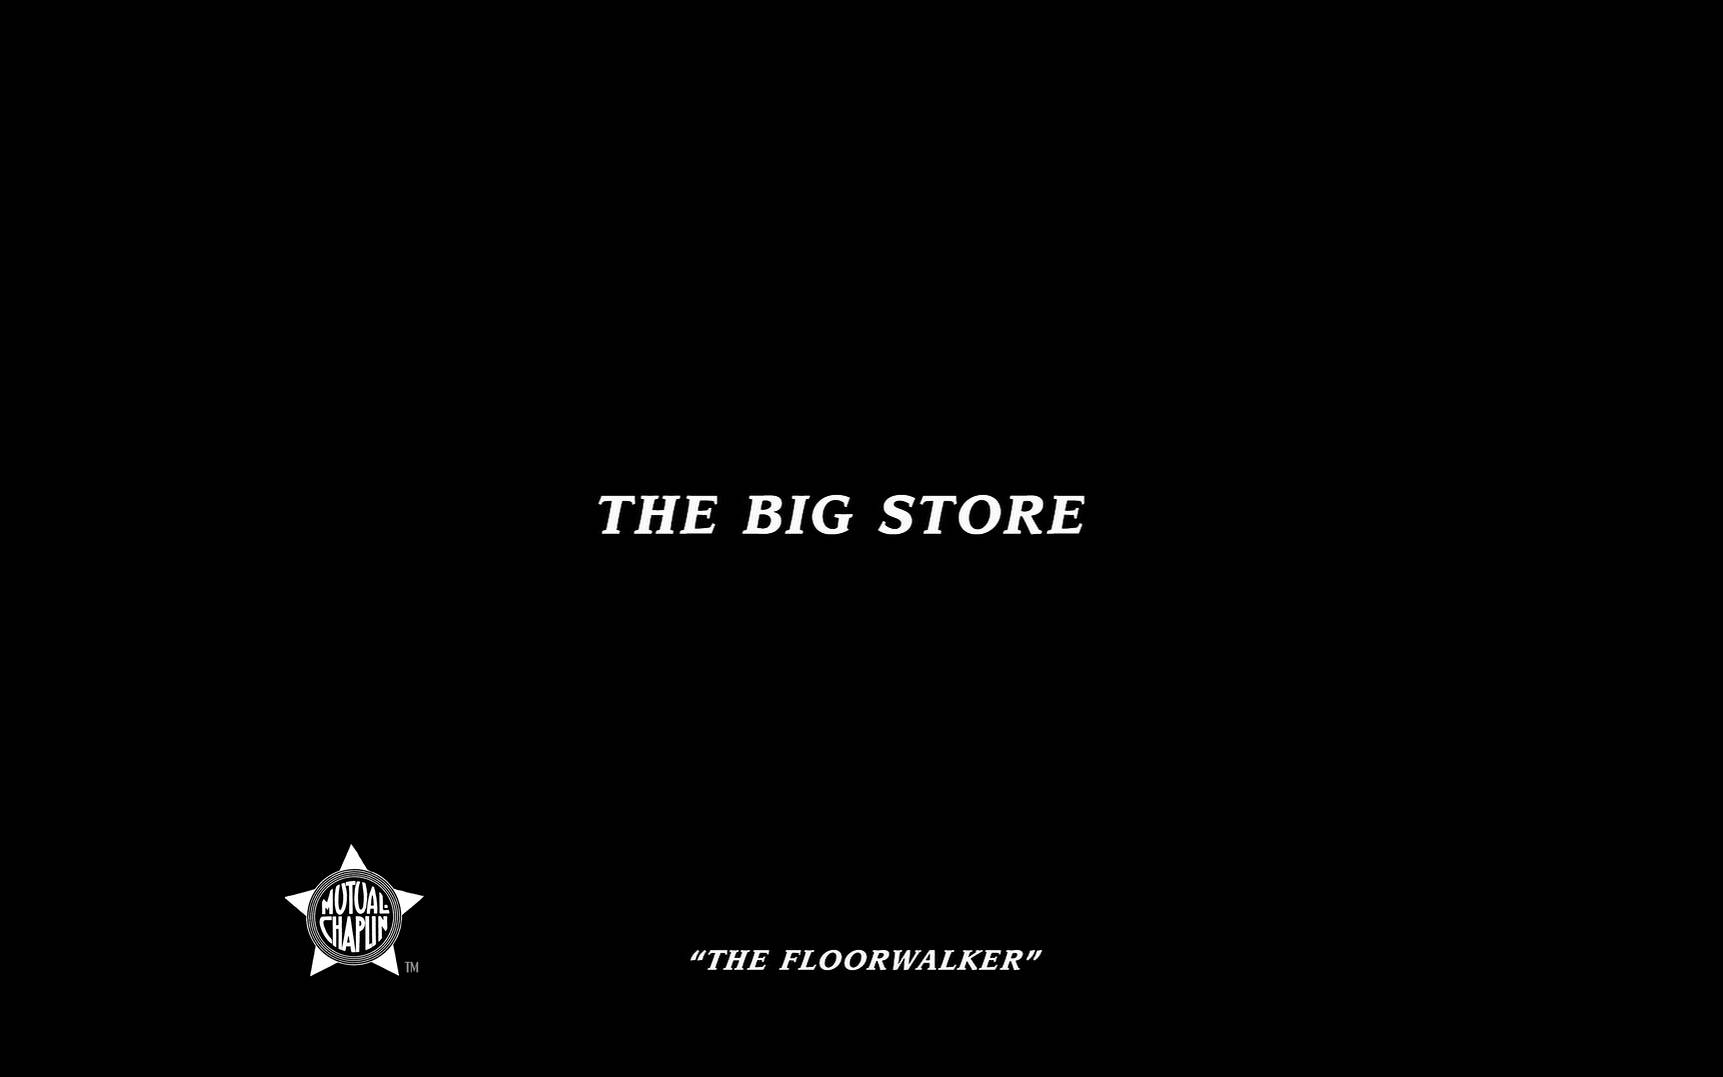 【1080p修复】卓别林黑白短剧THE BIG STORE